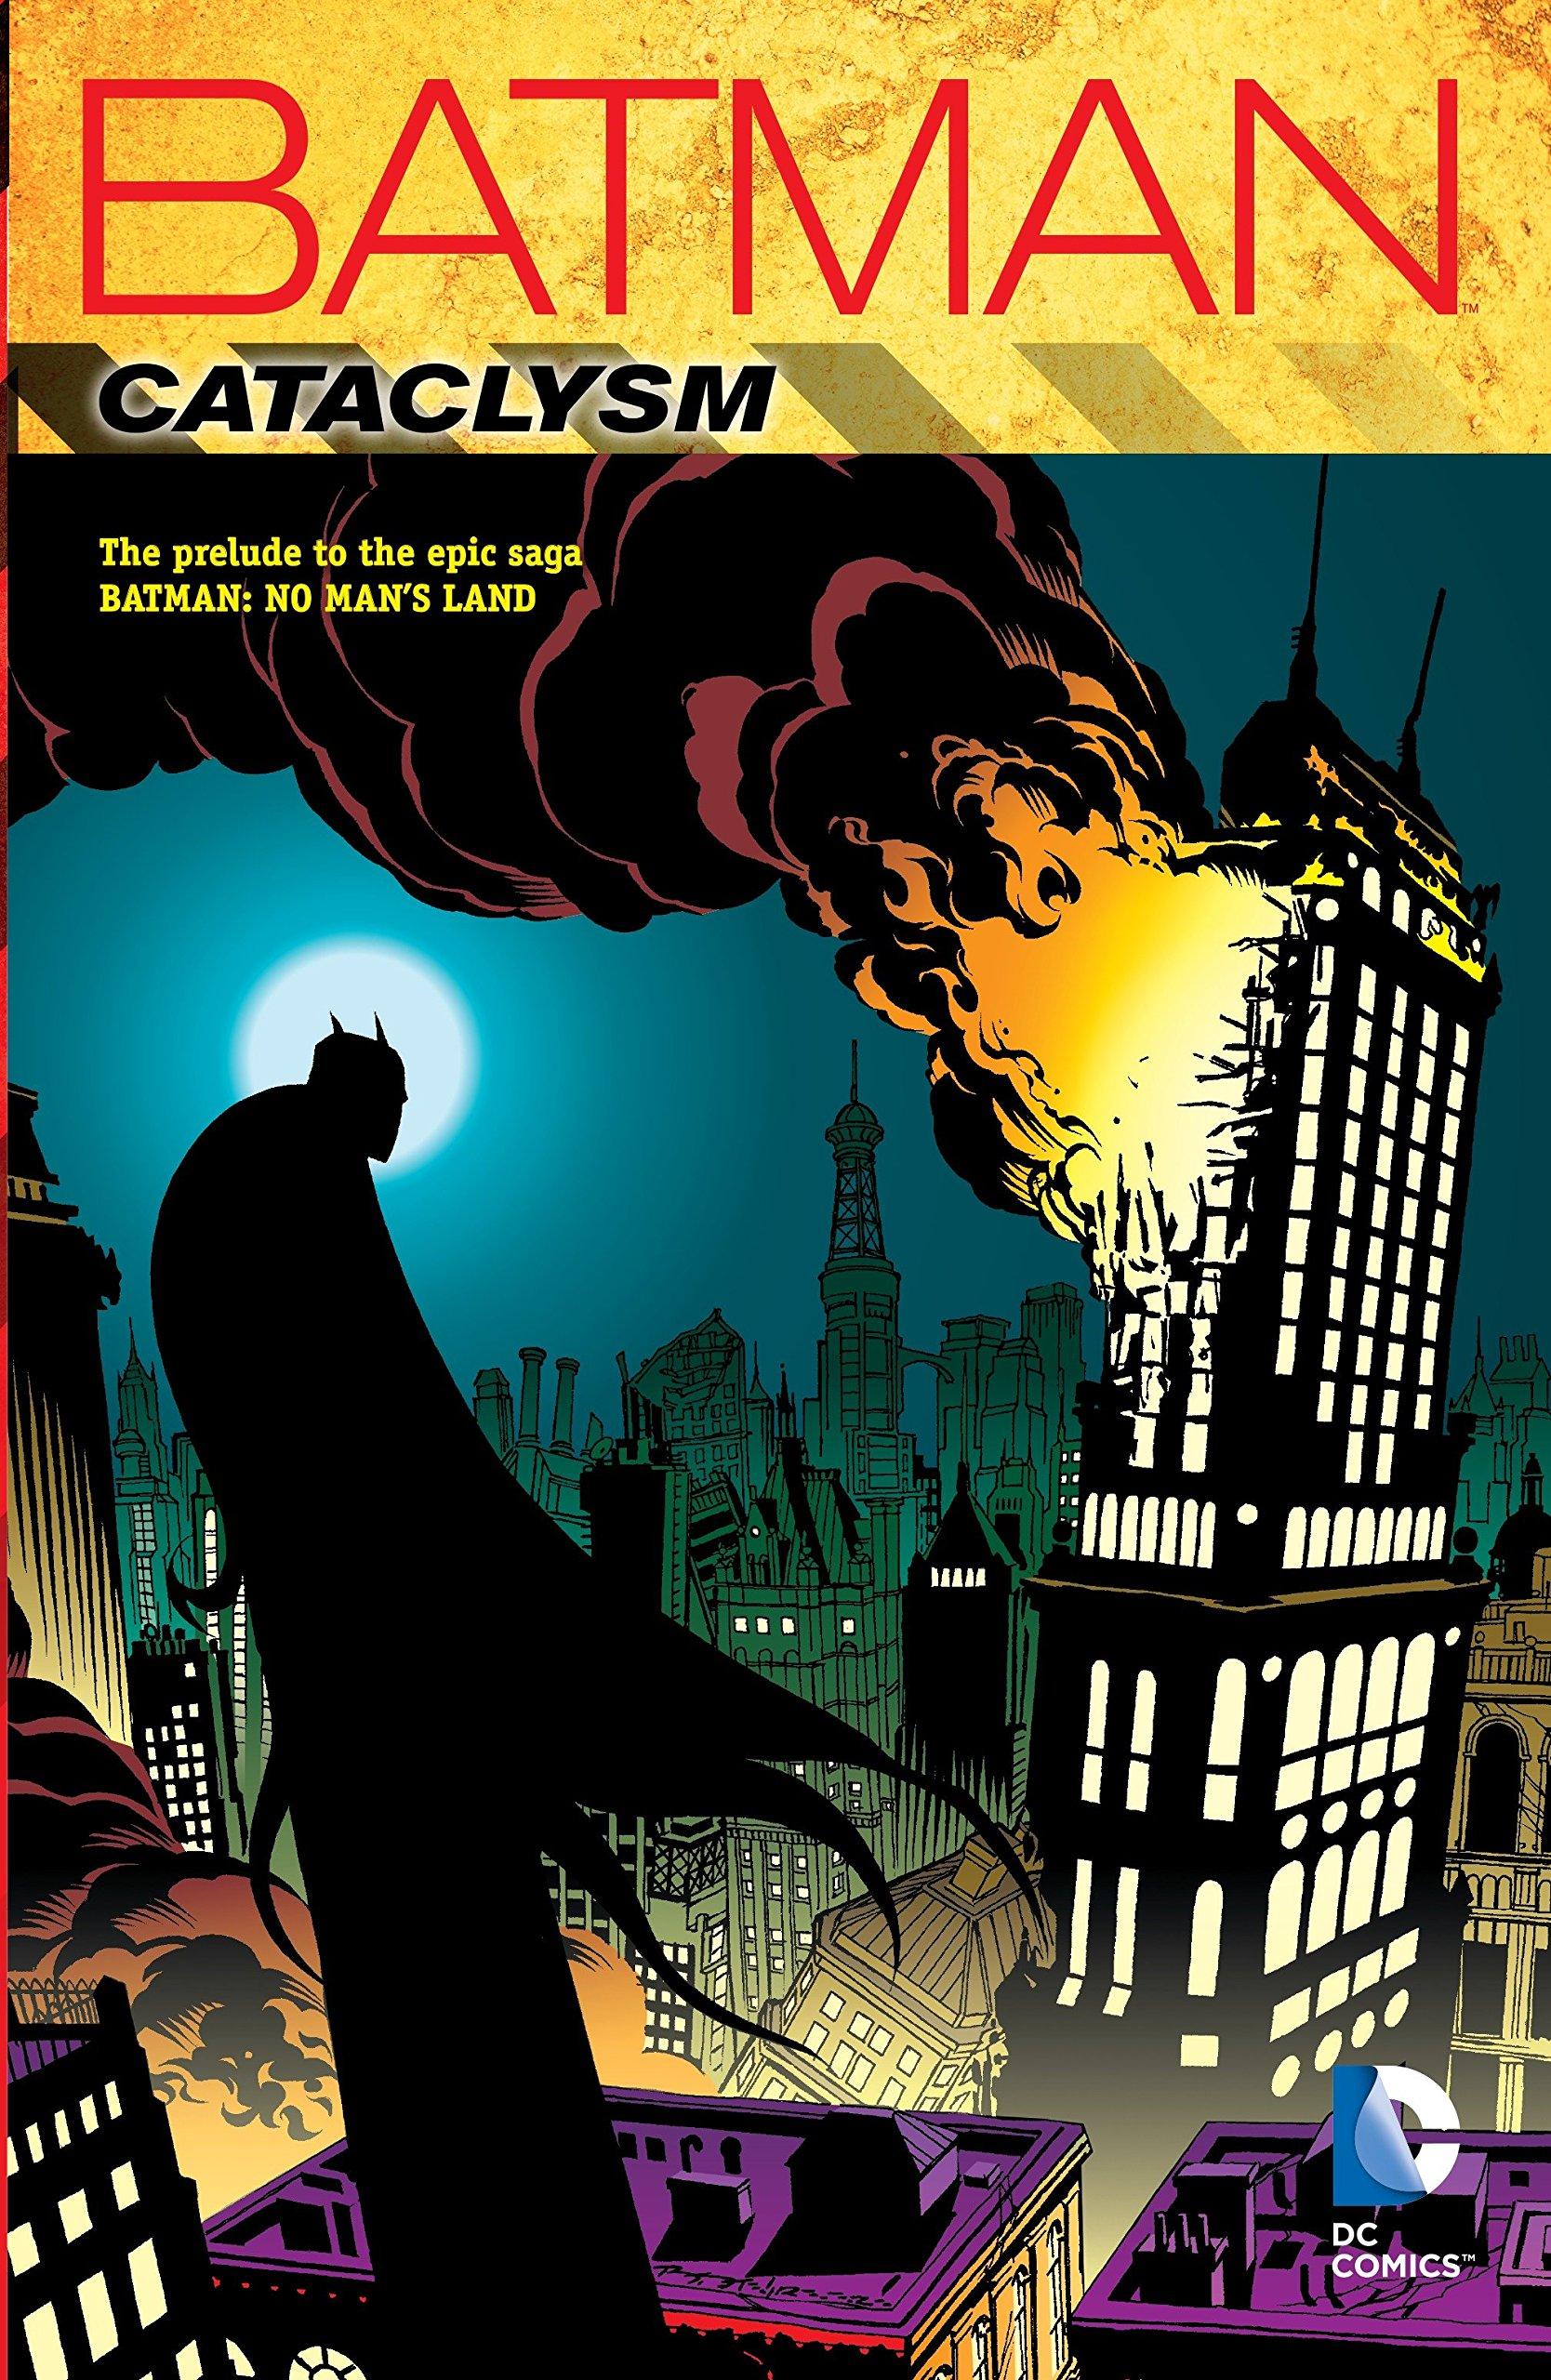 Batman: Cataclysm by Chuck Dixon, Jim Aparo